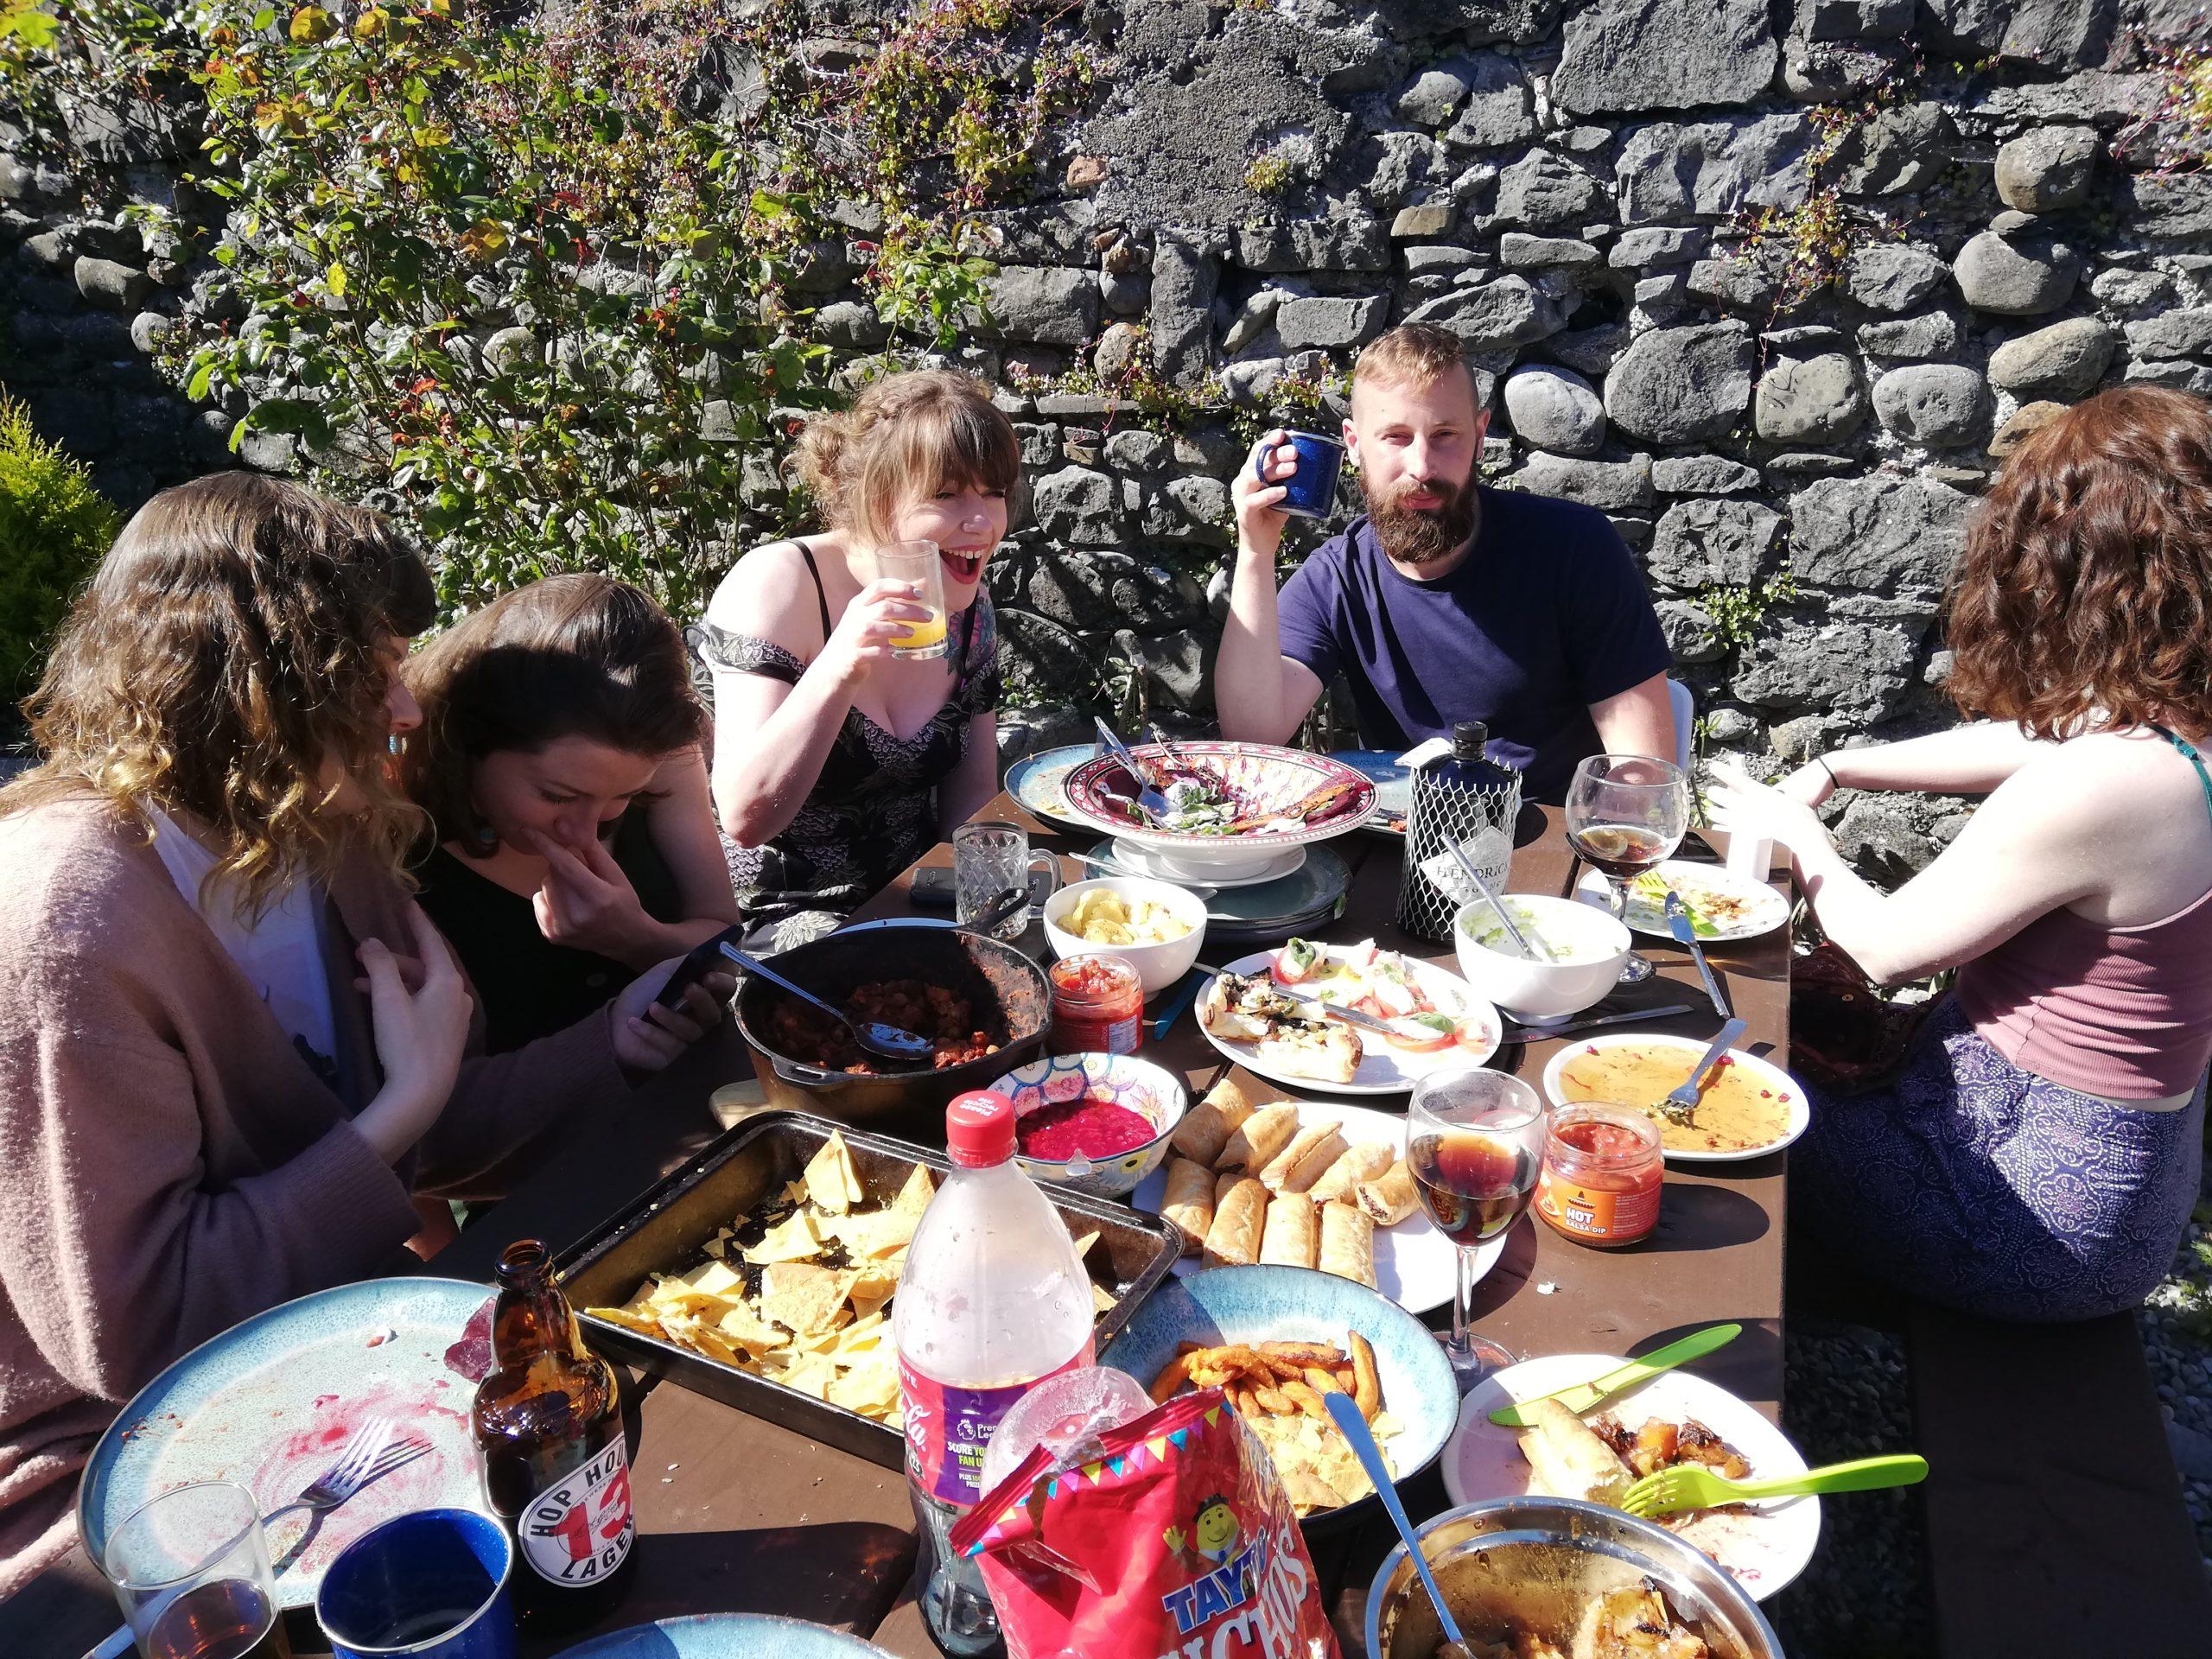 Crew enjoying a tasty picnic!